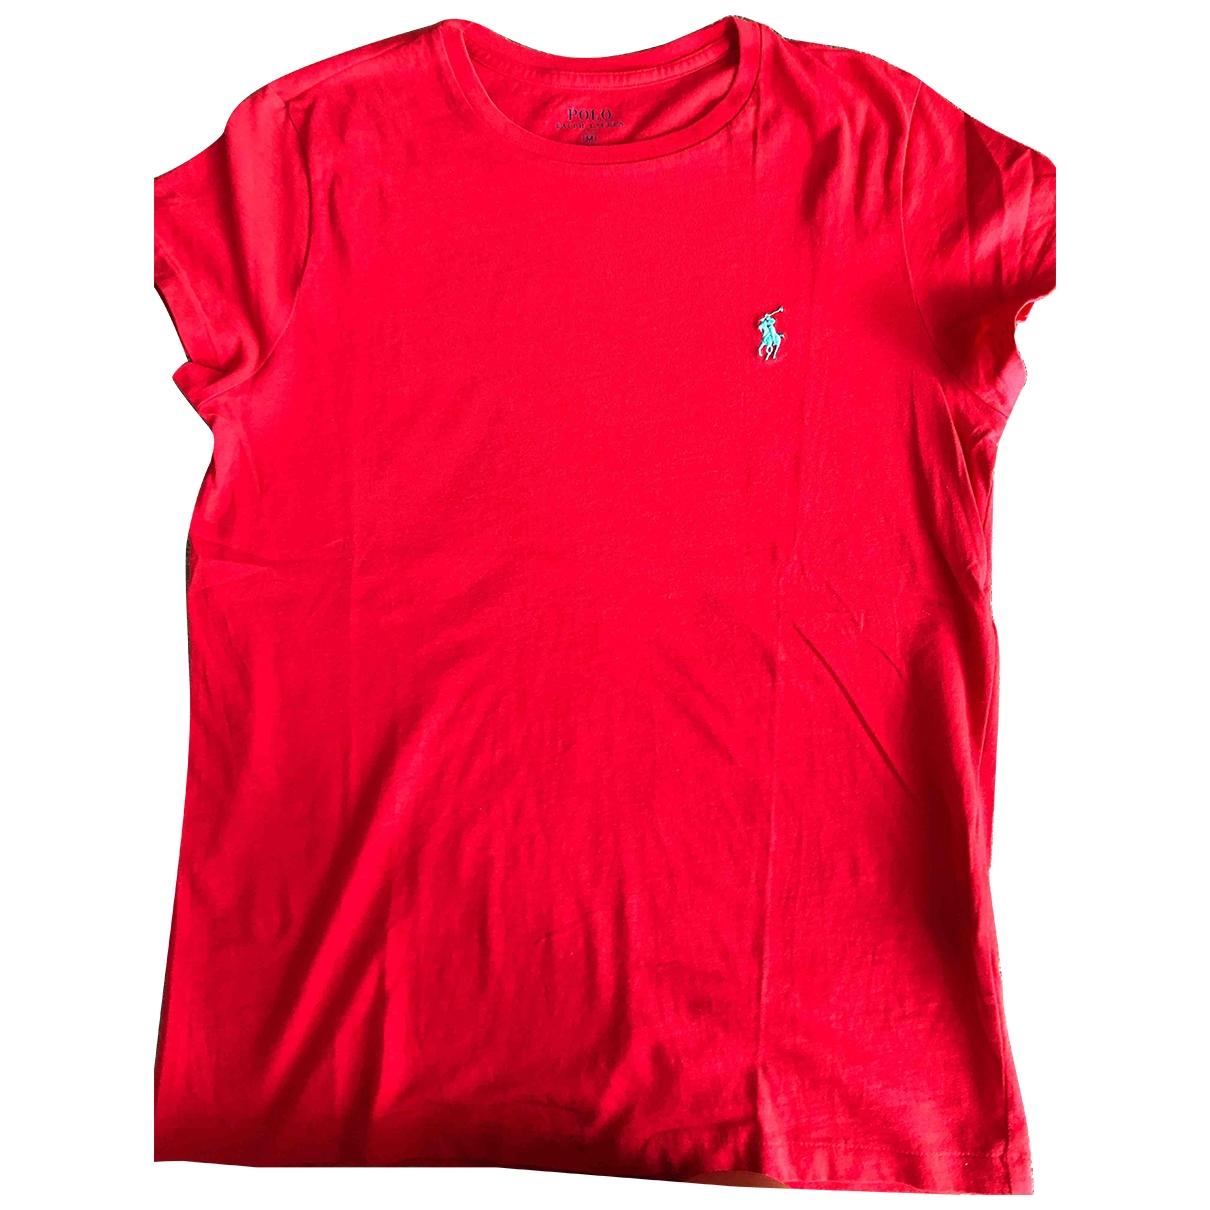 Camiseta Polo ajuste manches courtes Polo Ralph Lauren